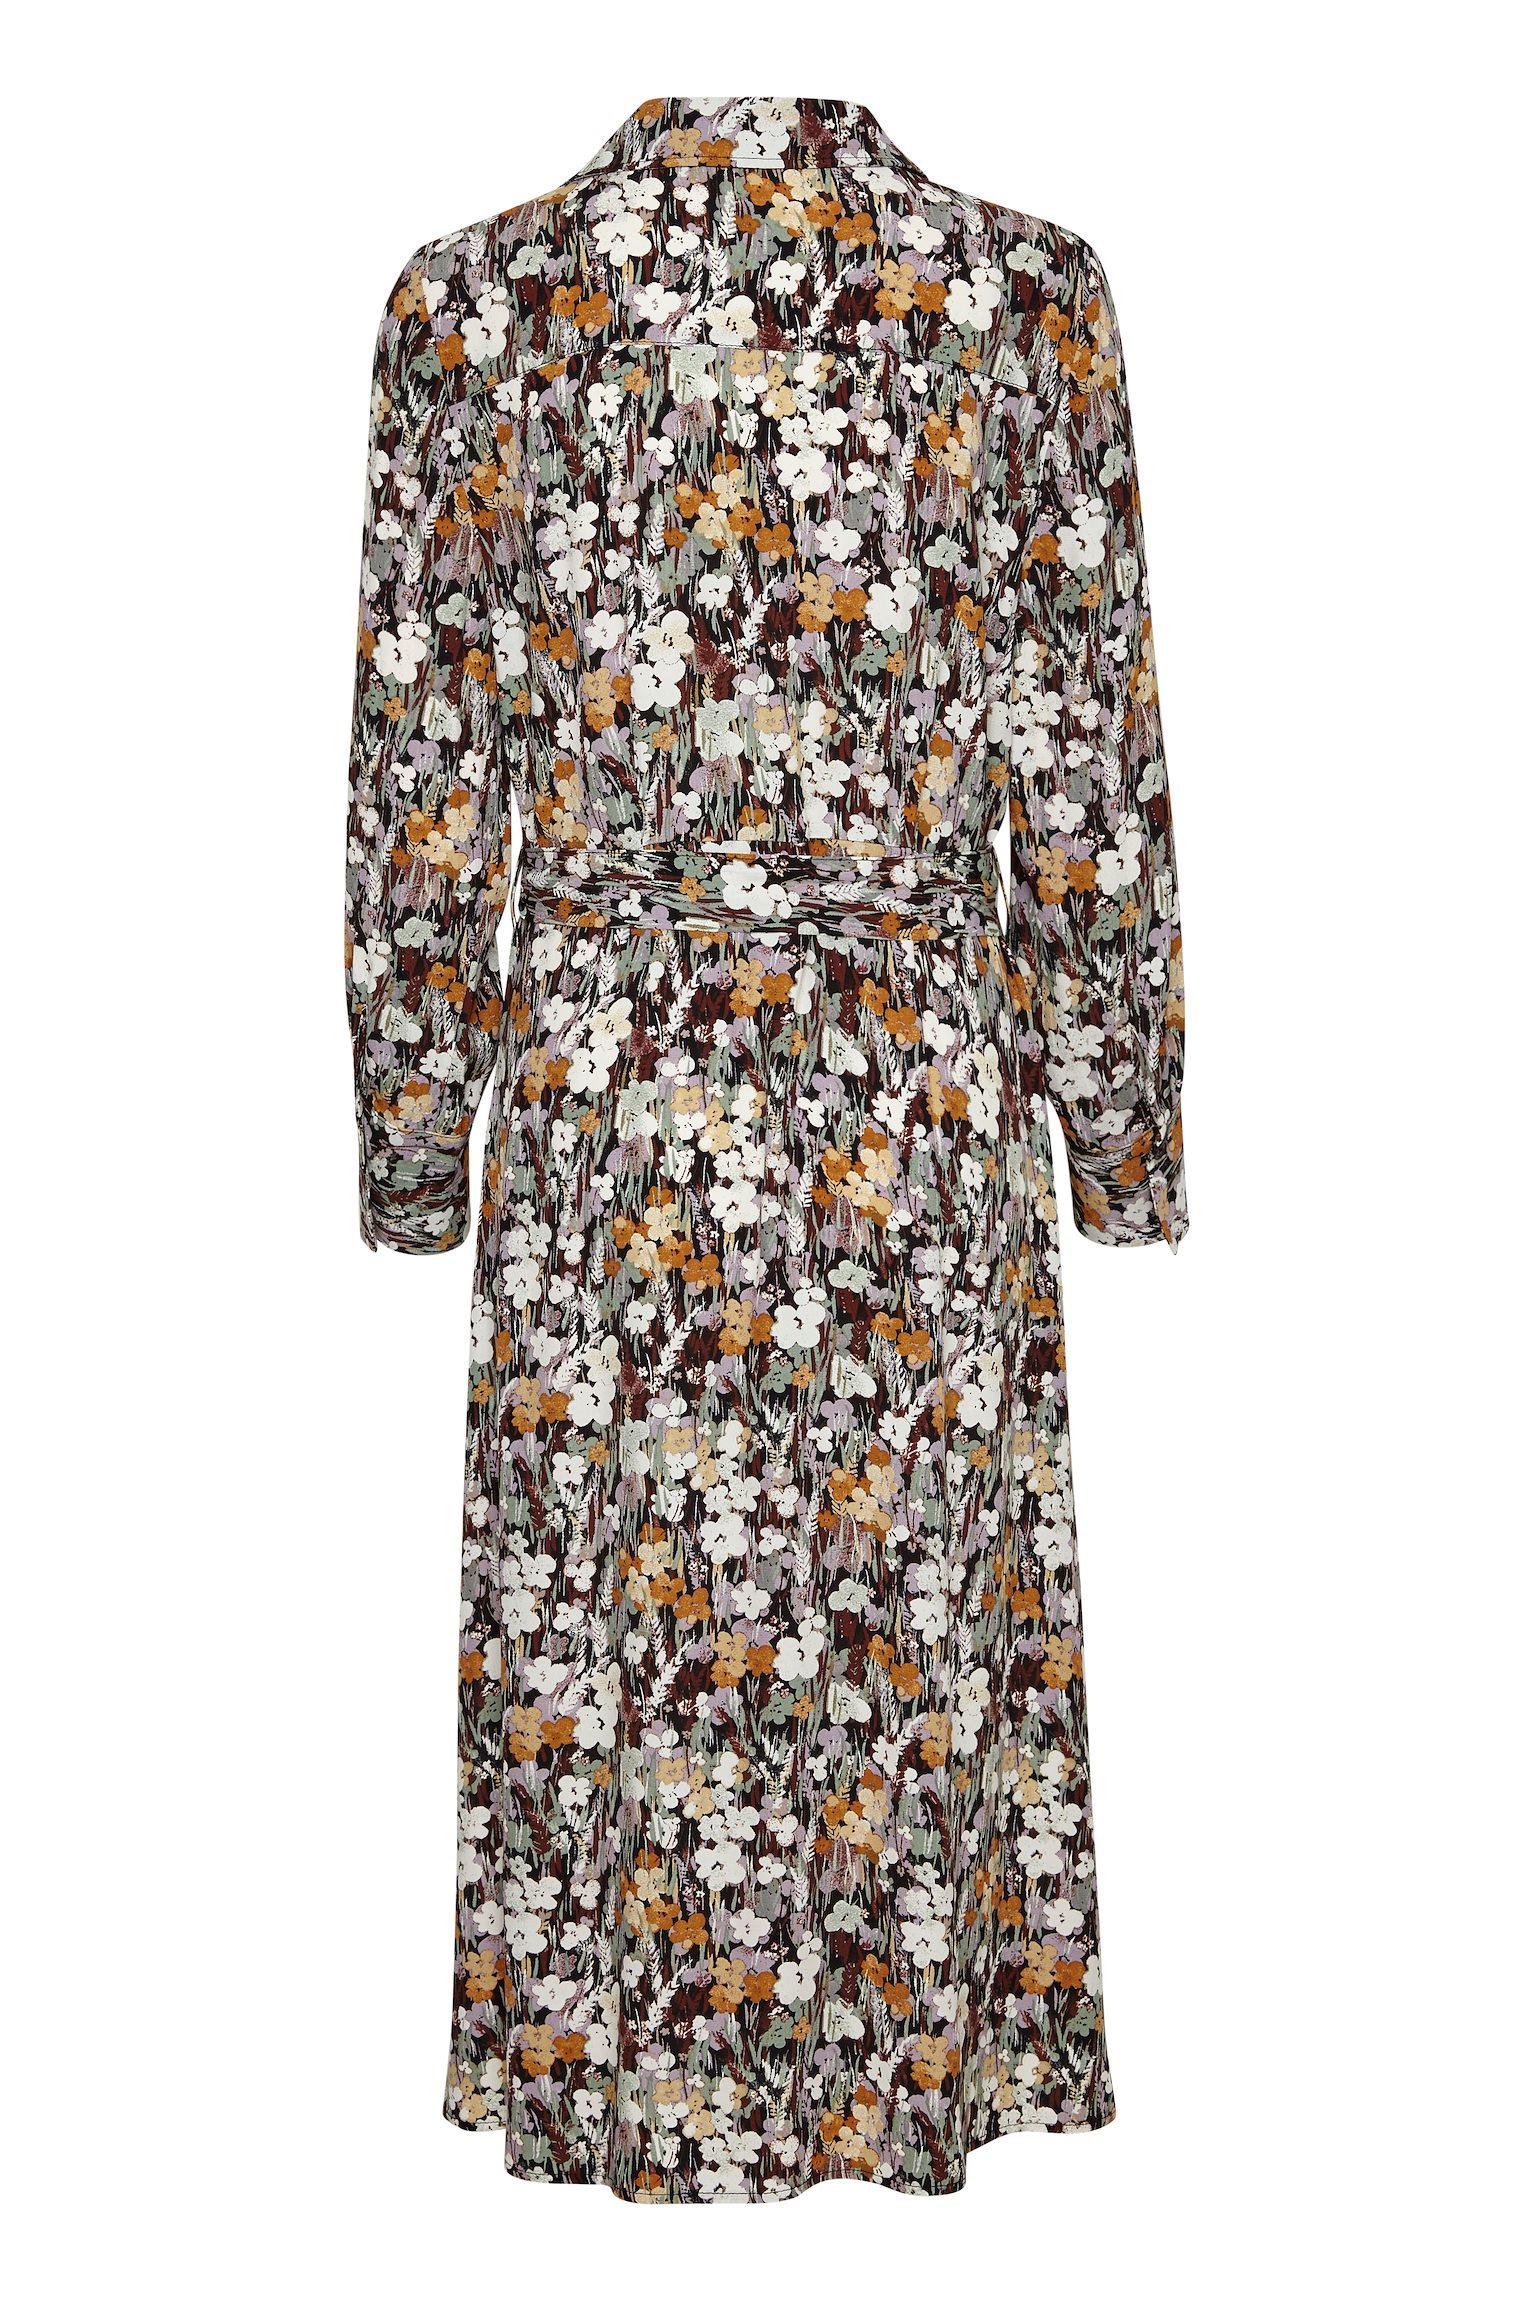 Vestido Mori Halima, visto por la espalda. Soaked in Luxury.